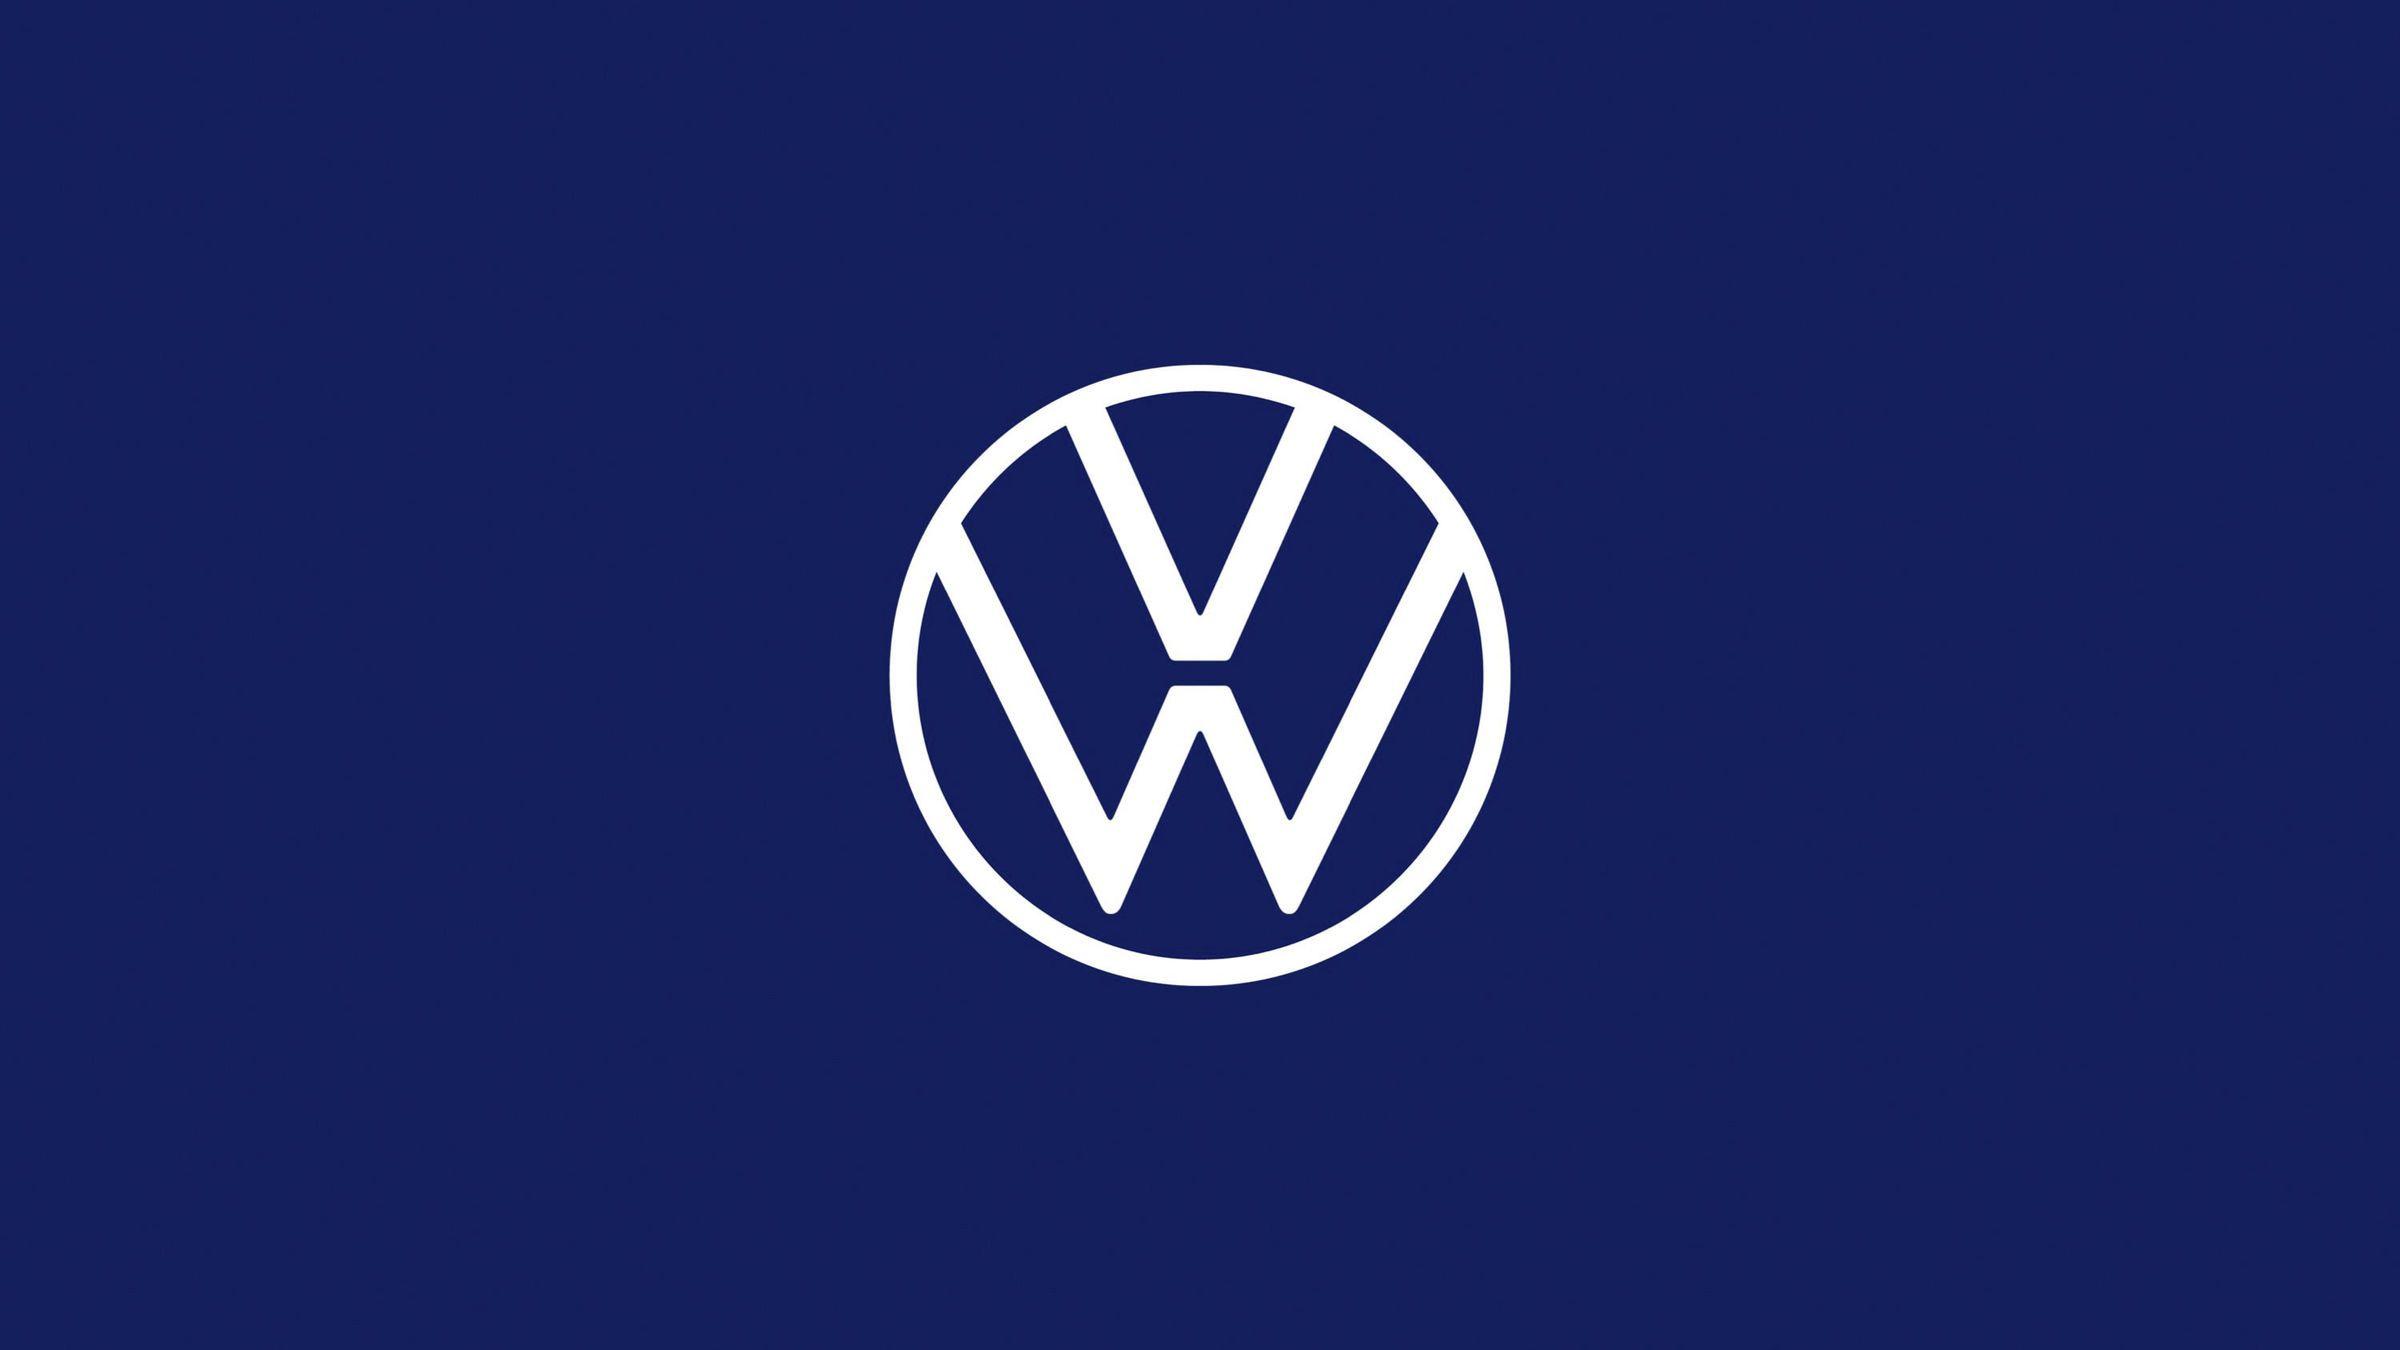 Volkswagen Unveils New Brand Design And Logo Volkswagen Newsroom In 2020 Volkswagen Volkswagen Company Logos